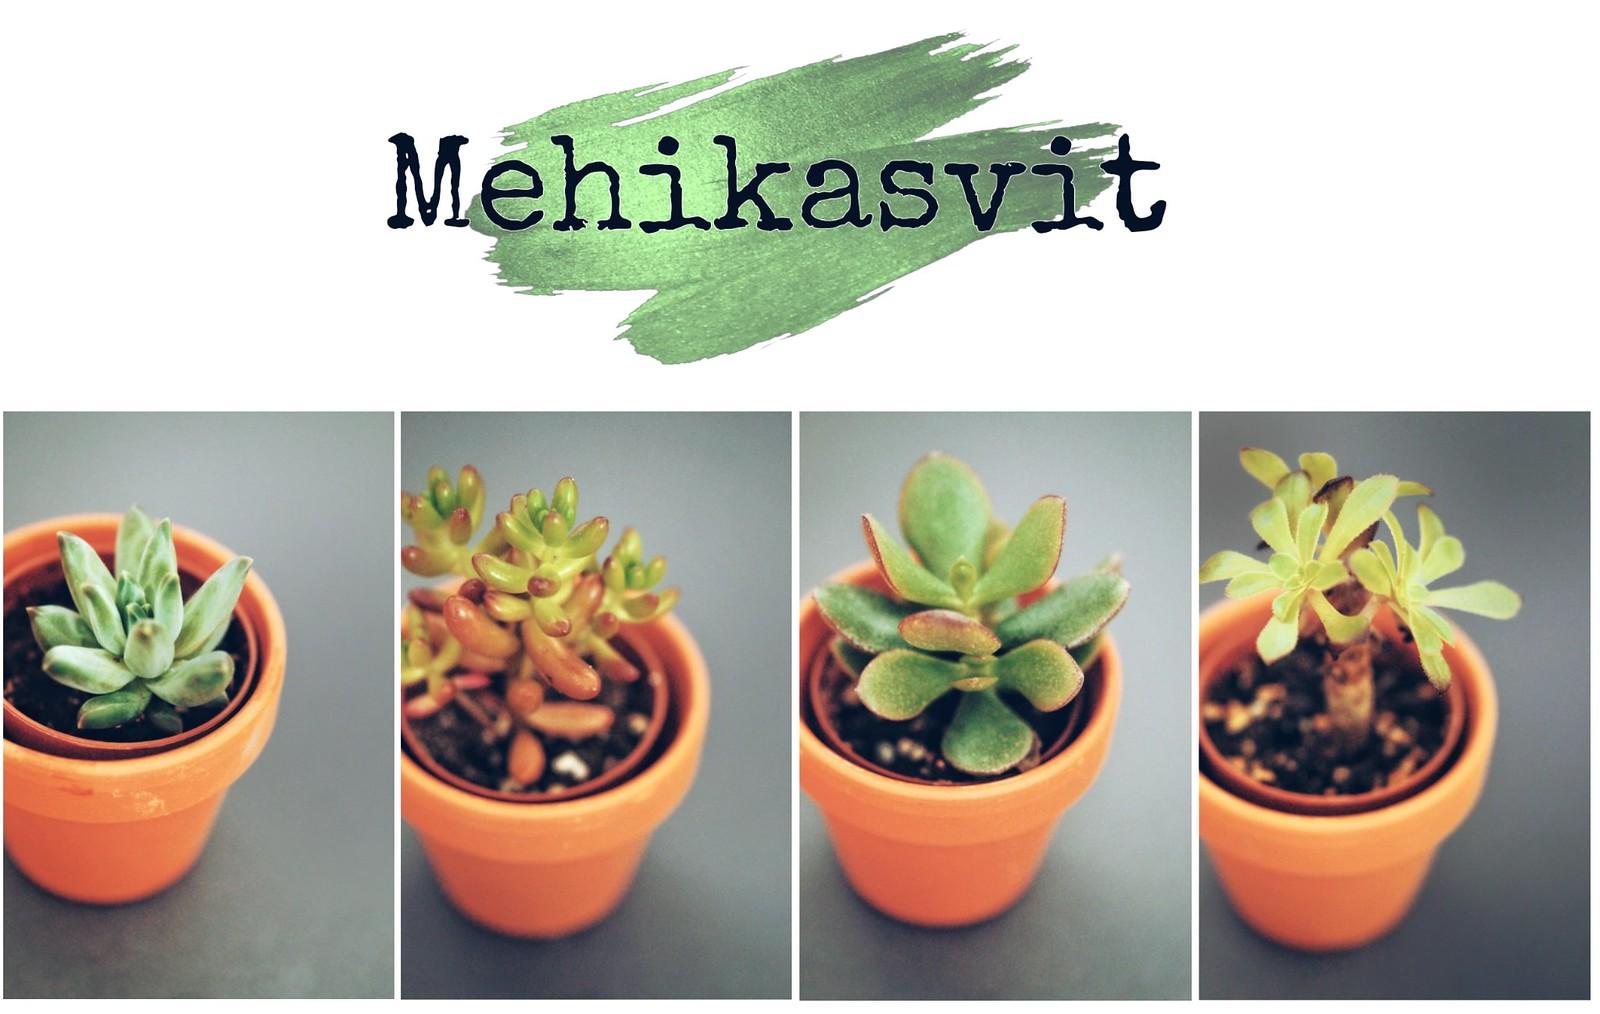 mehikasvit-viherkasvit-blogi